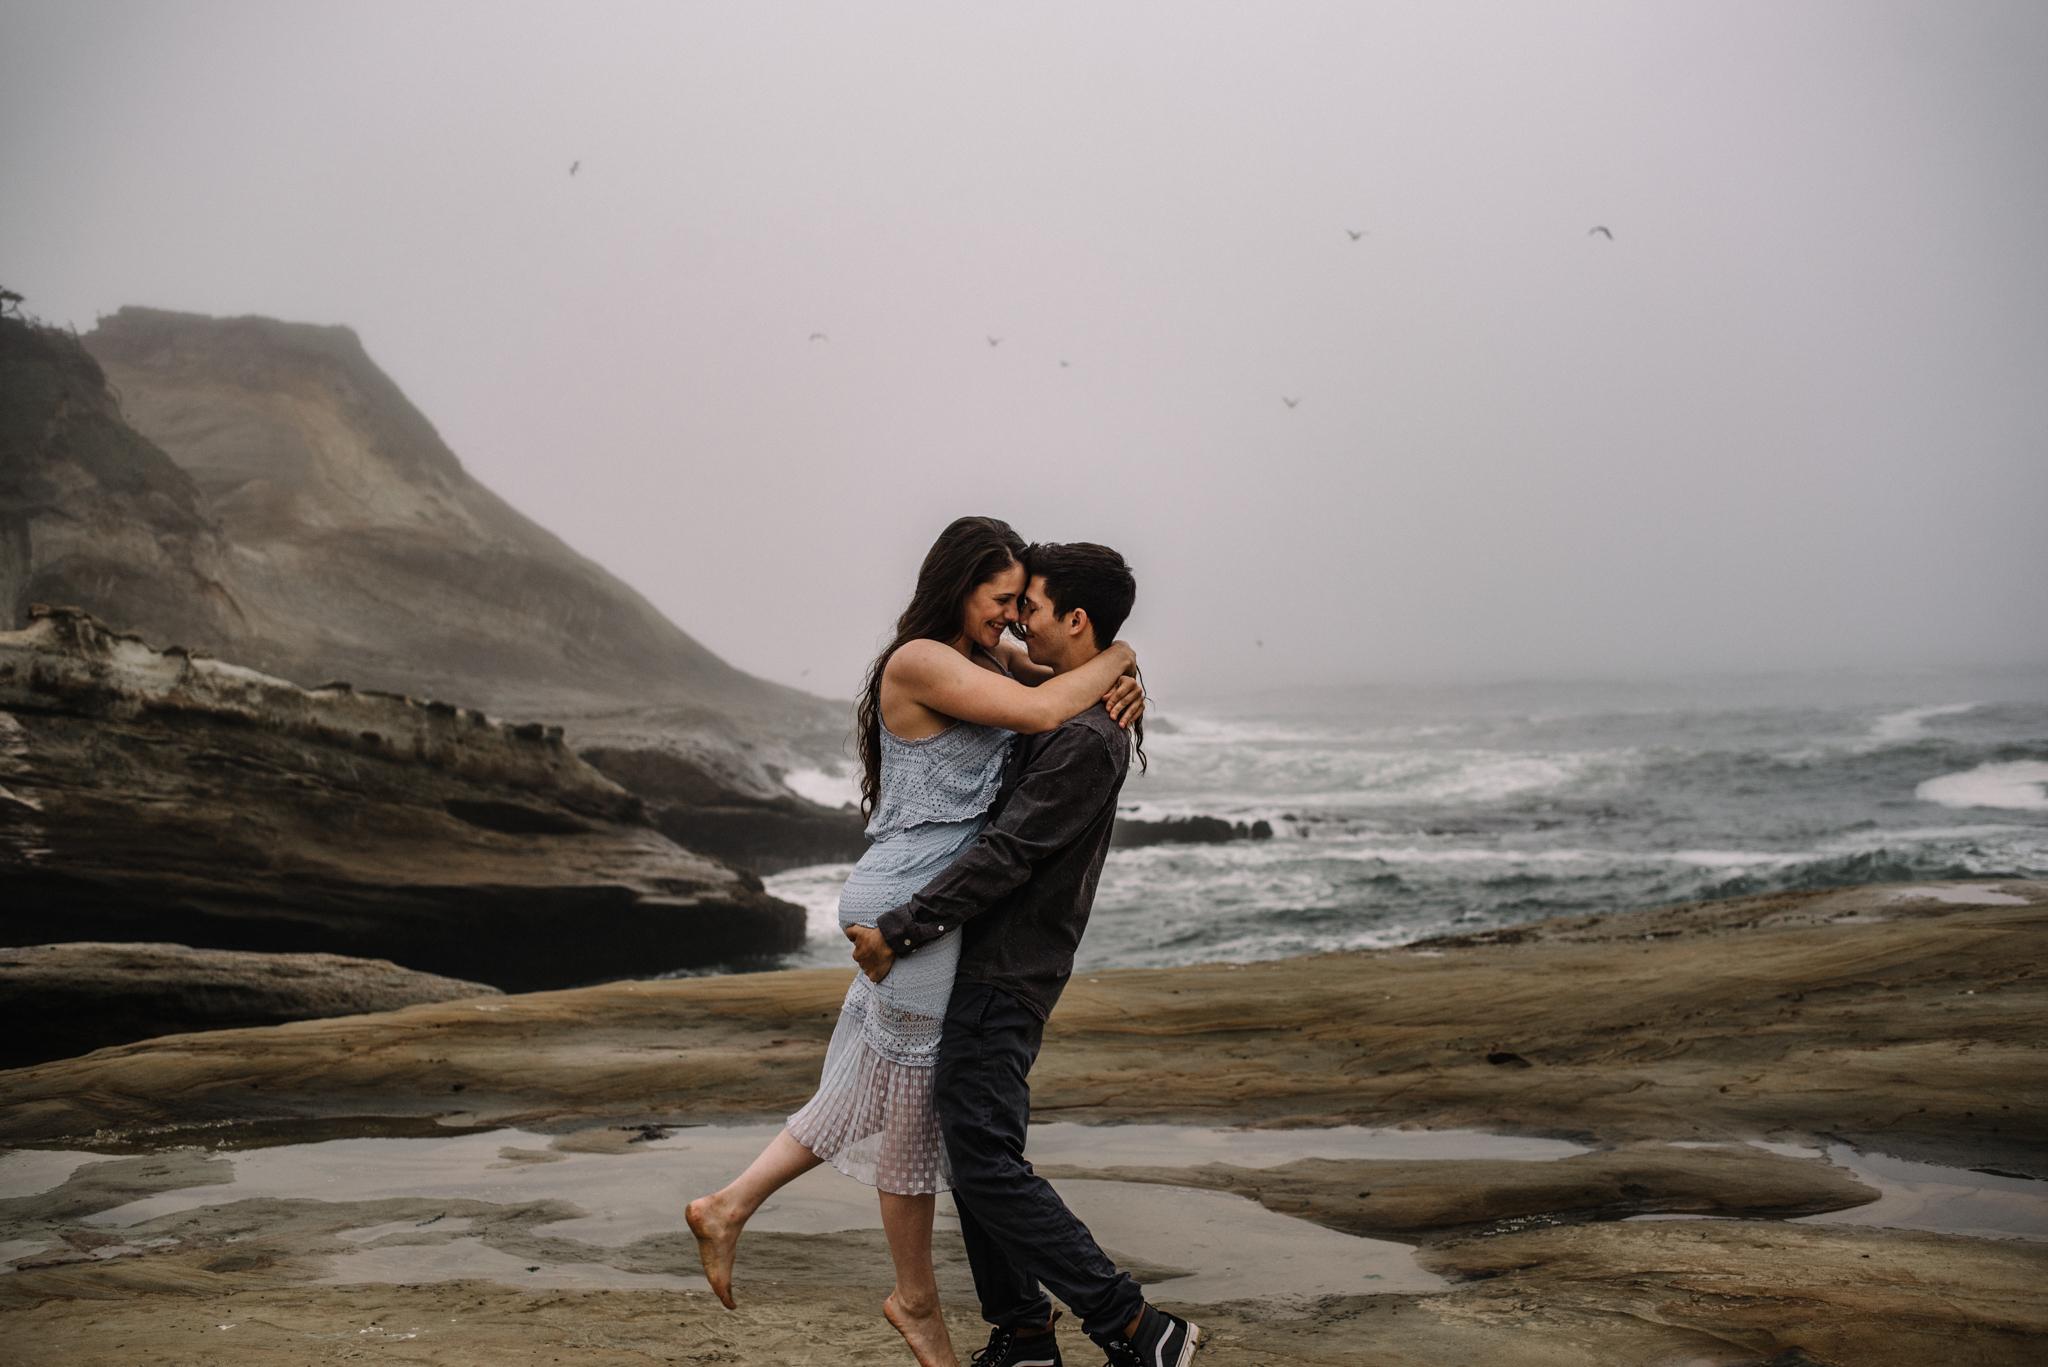 Ruthie and Anthony - Foggy Oregon Coast Couple Adventure Session - White Sails Photography Creative_25.JPG